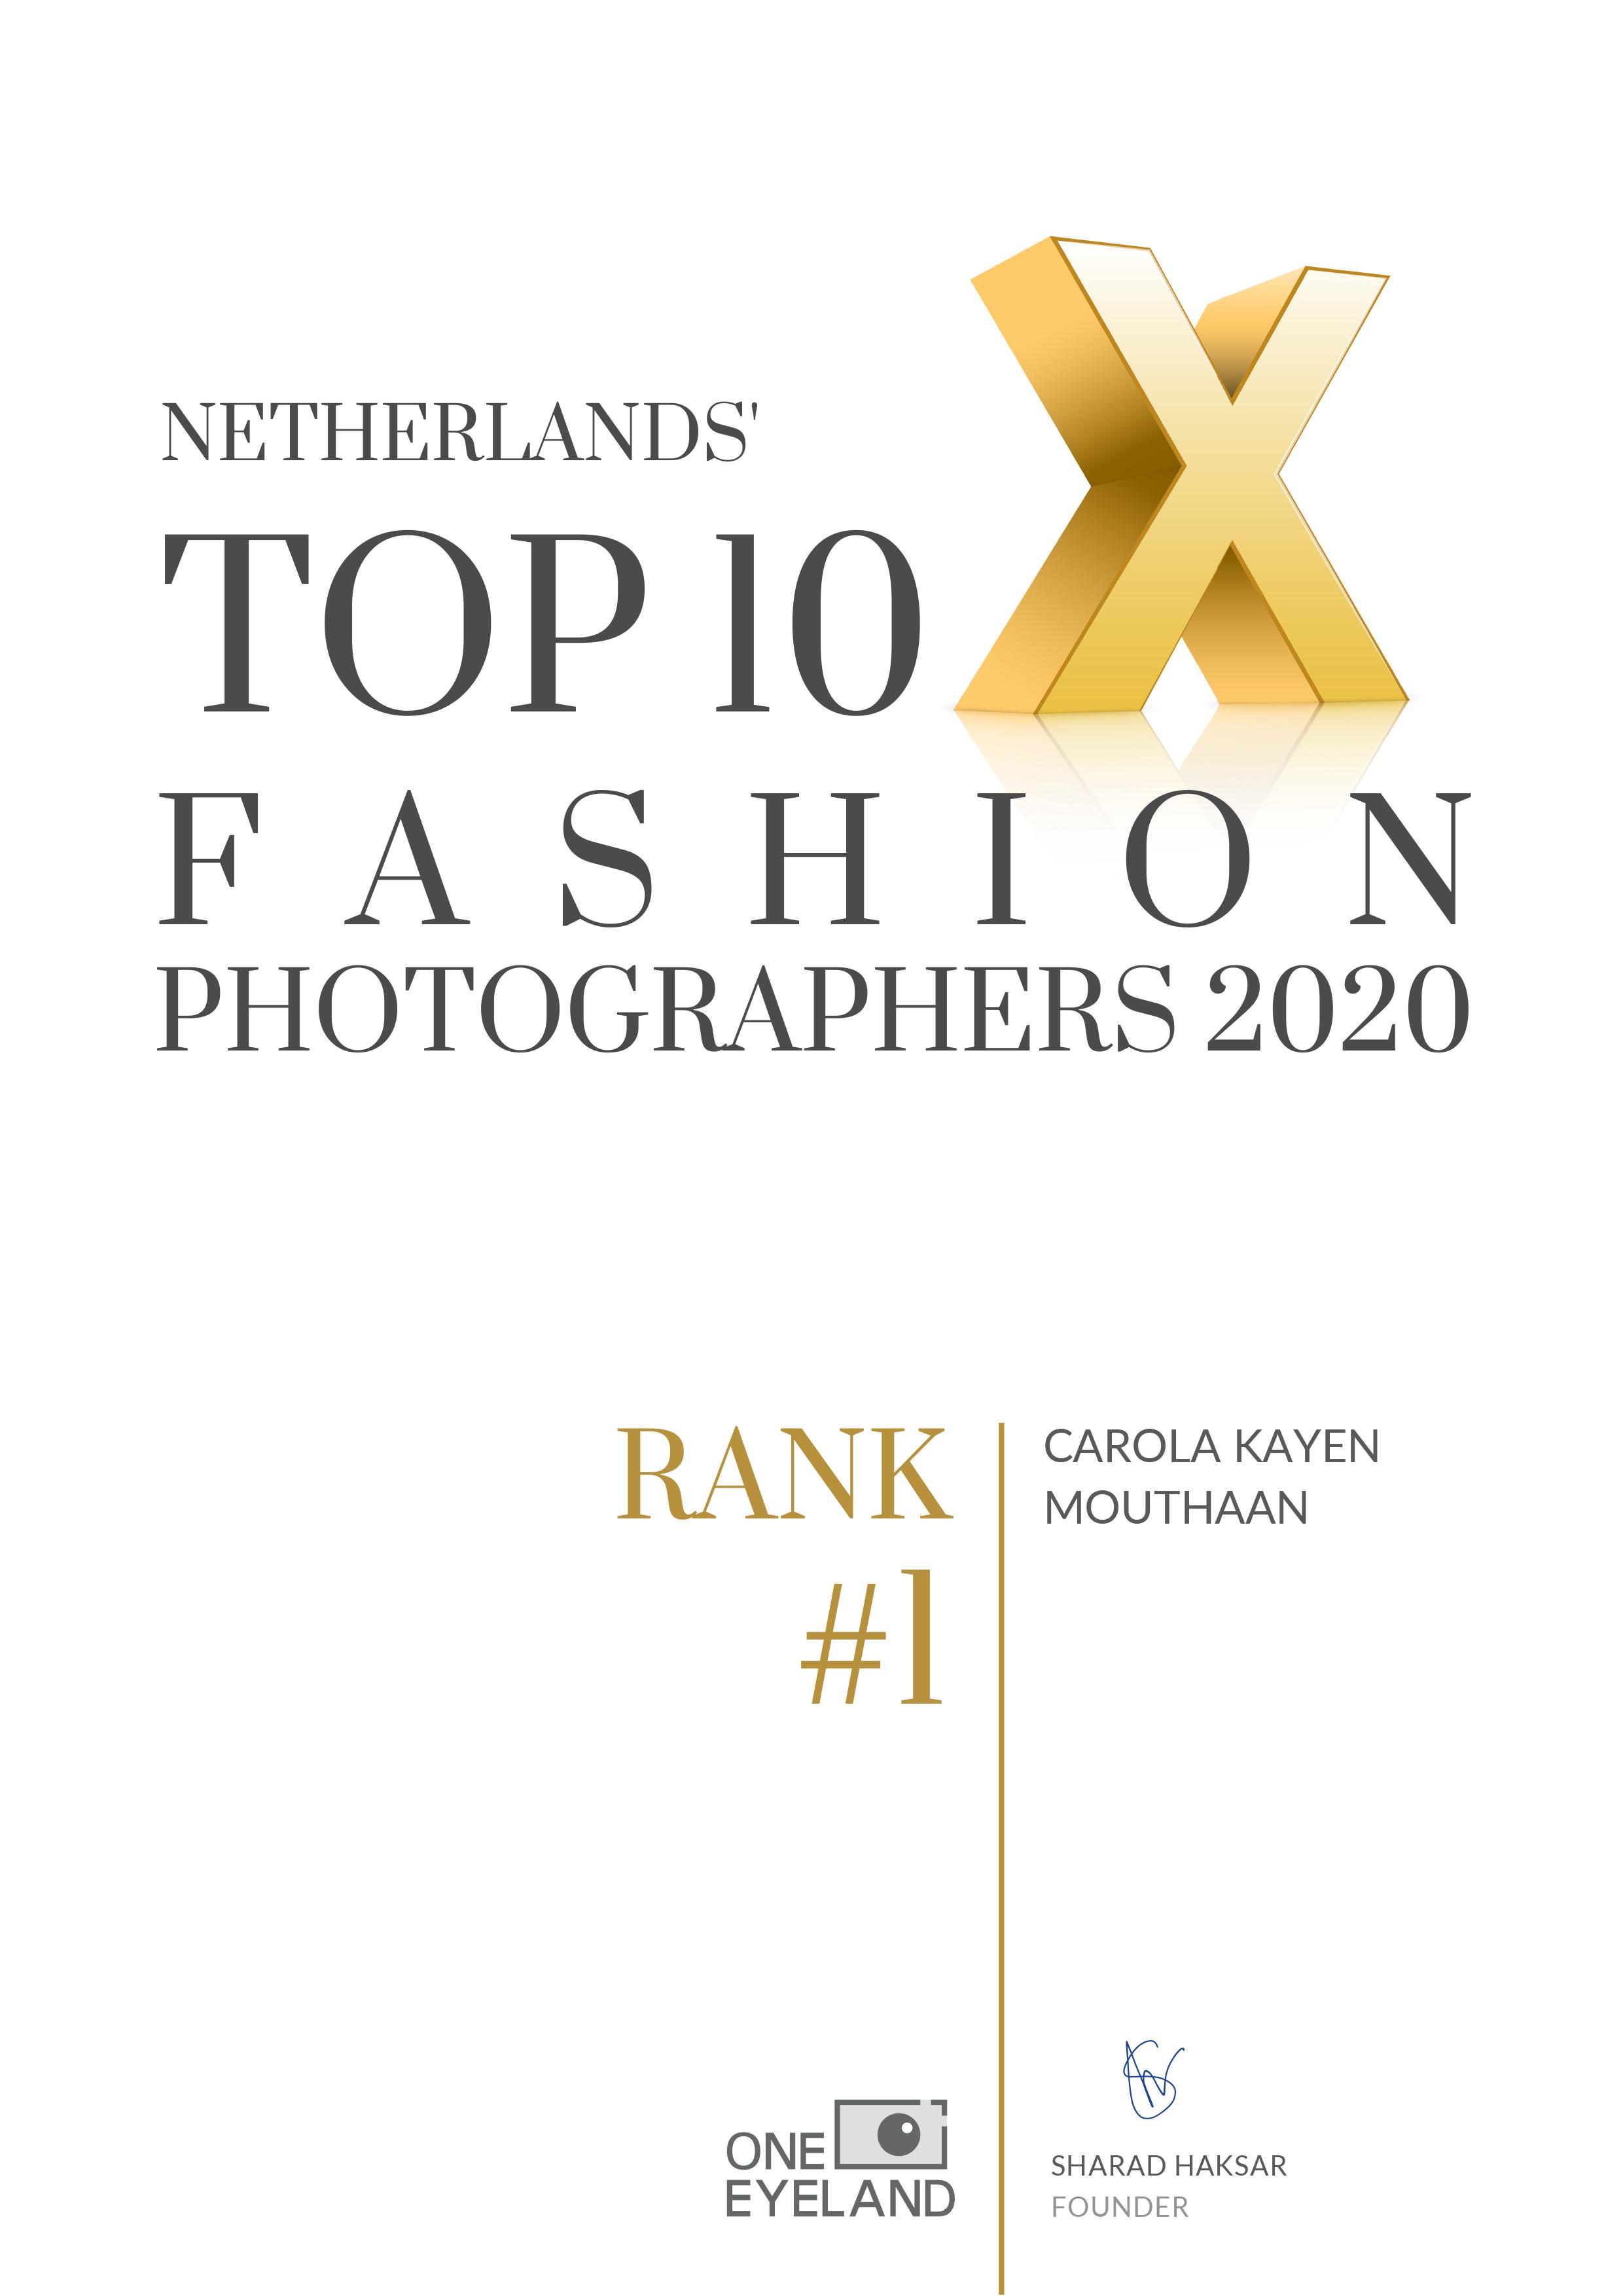 Netherlands' Top 10 Fashion Photographers 2020 - Carola Kayen Mouthaan